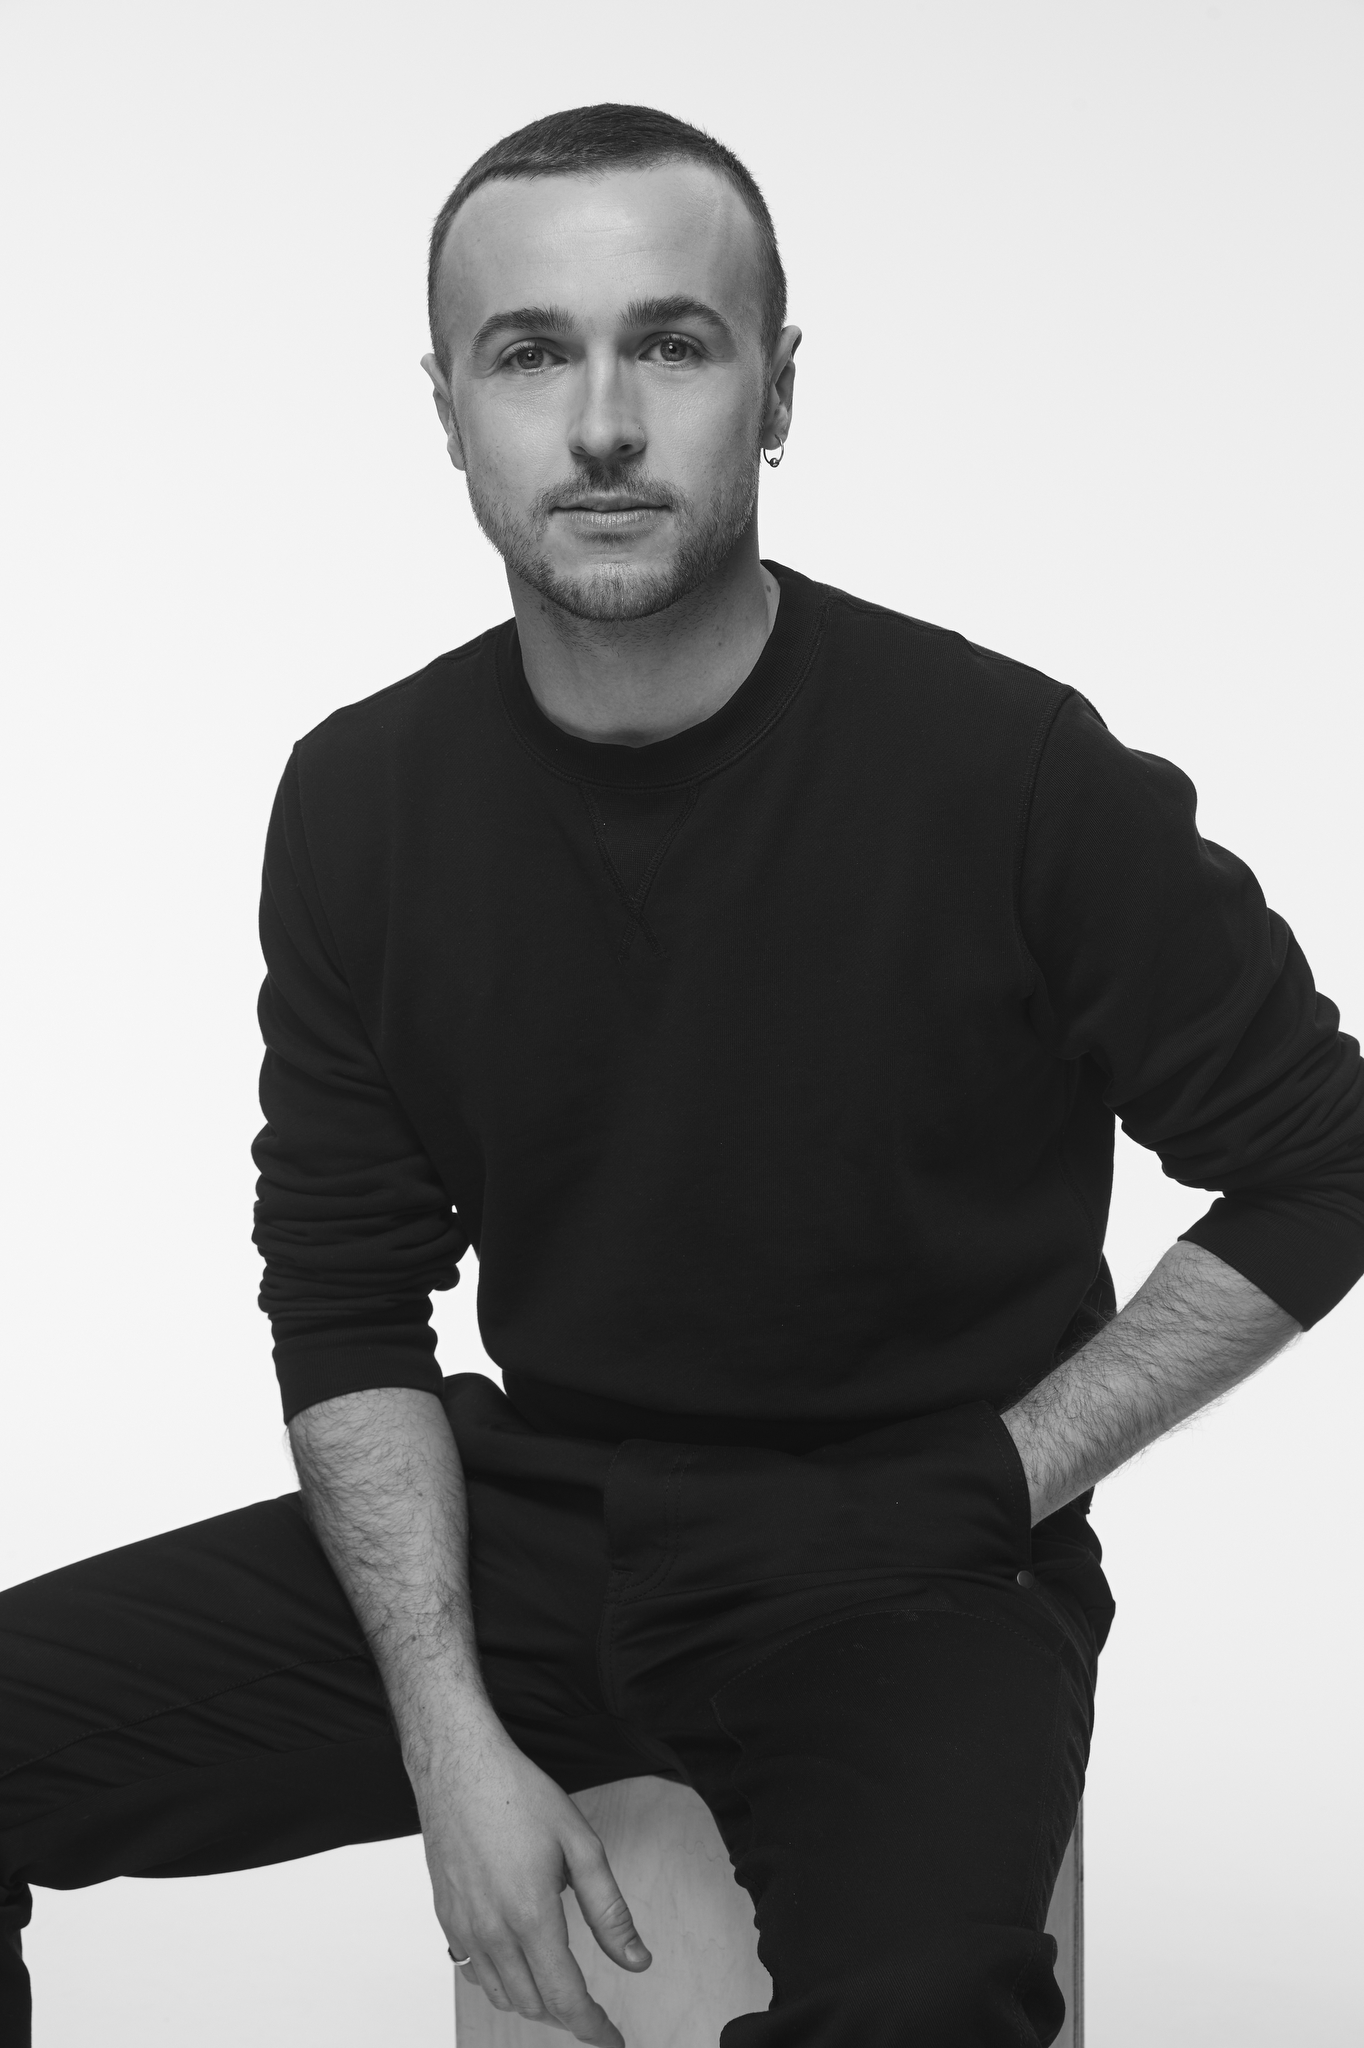 Joseph McGee